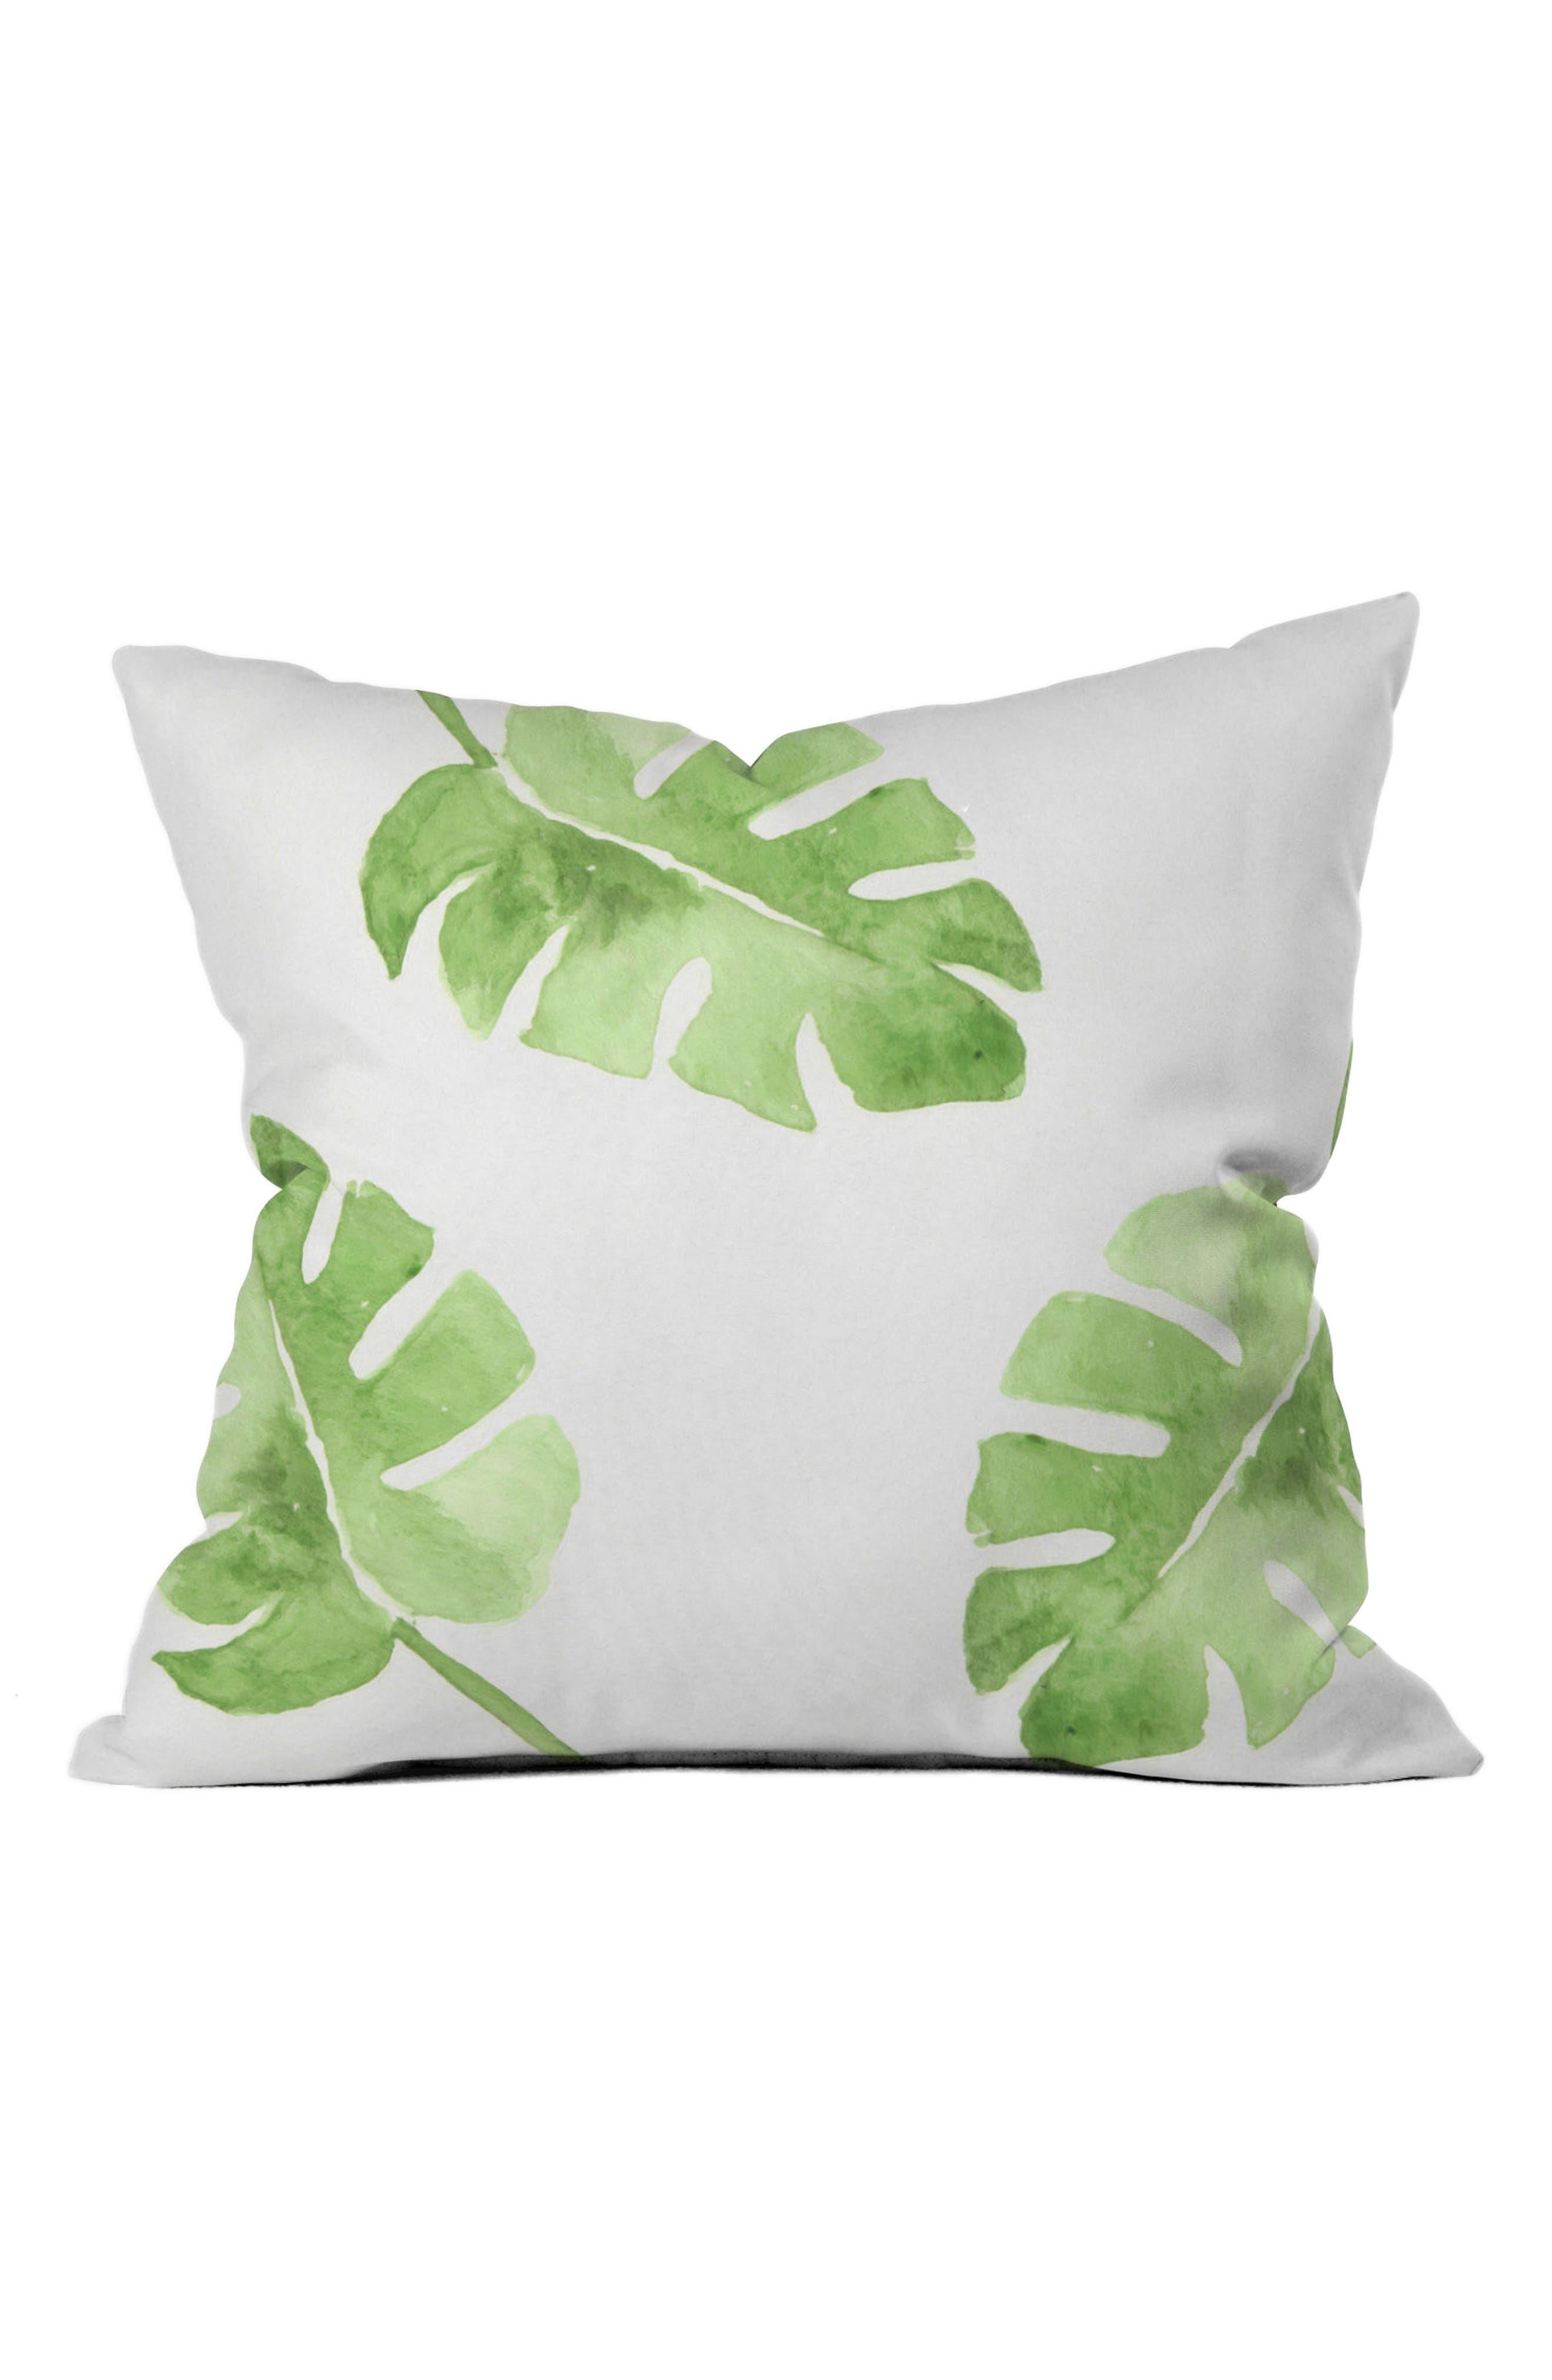 DENY Designs Wonder Forest Pillow